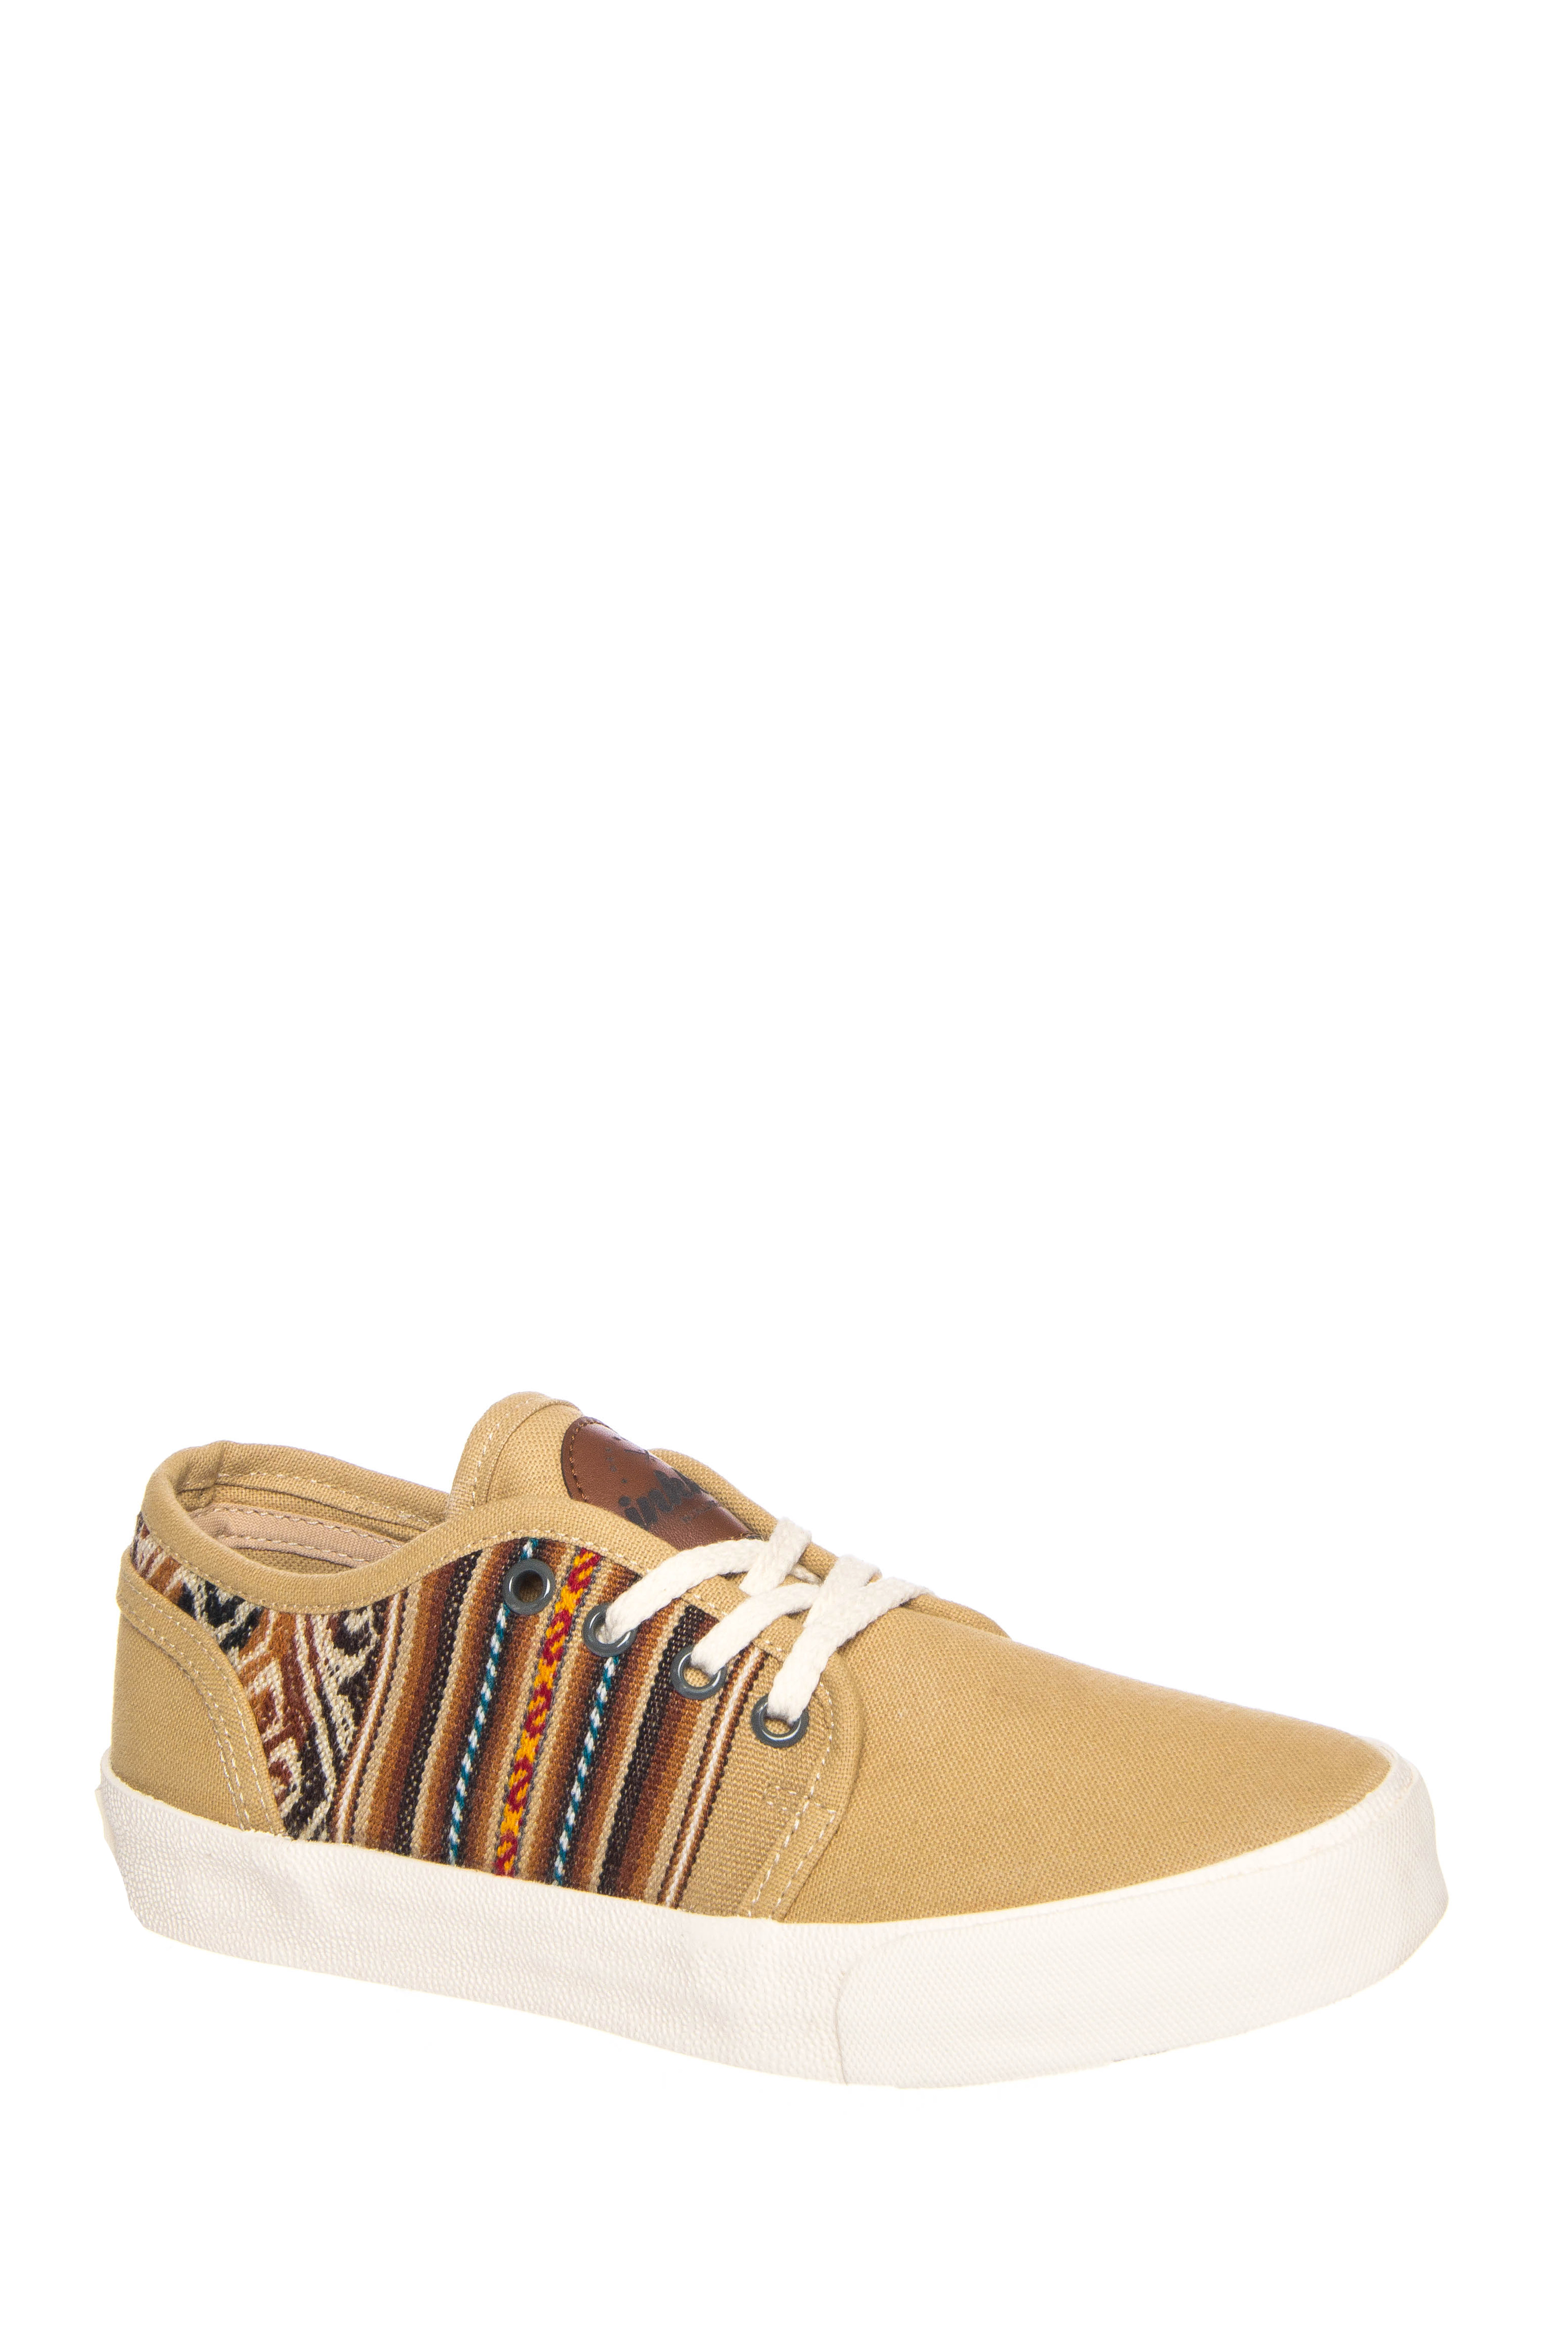 Inkkas Slant Low Top Sneakers - Desert